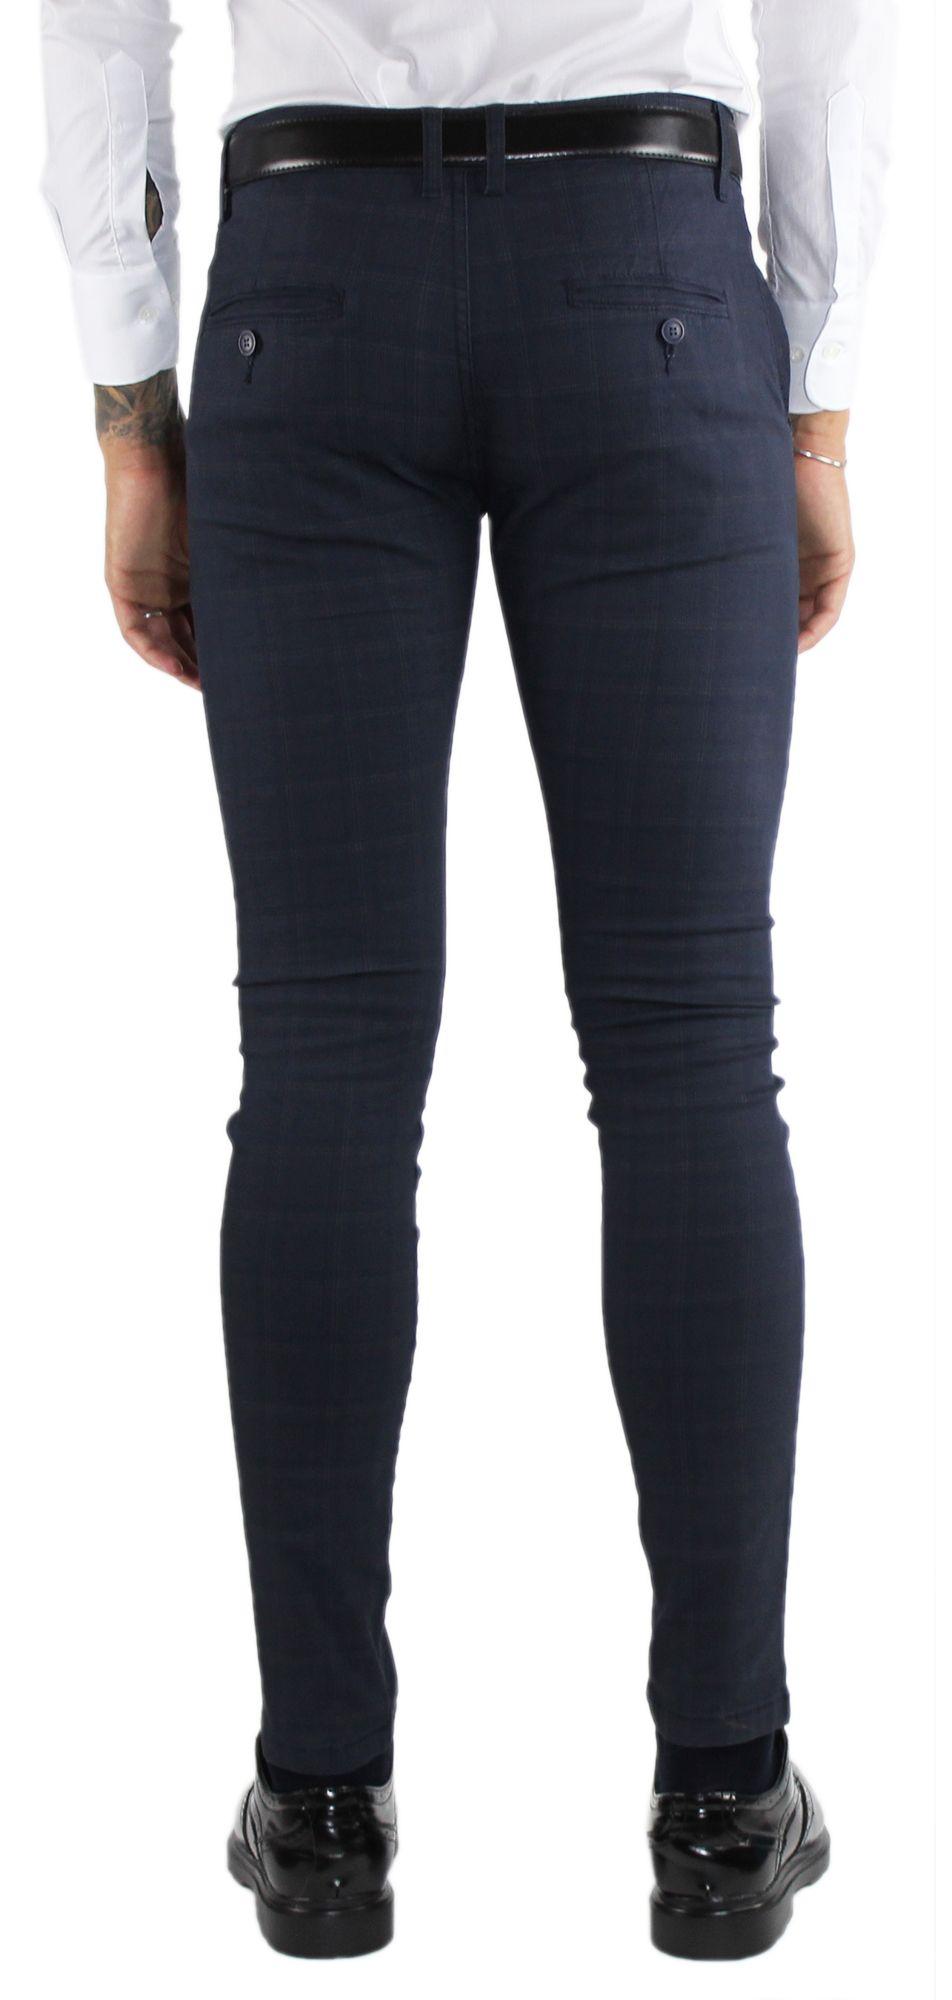 Pantaloni-Uomo-Invernali-a-Quadri-Eleganti-Pantalone-Slim-Fit-Elasticizzati-Scoz miniatura 8